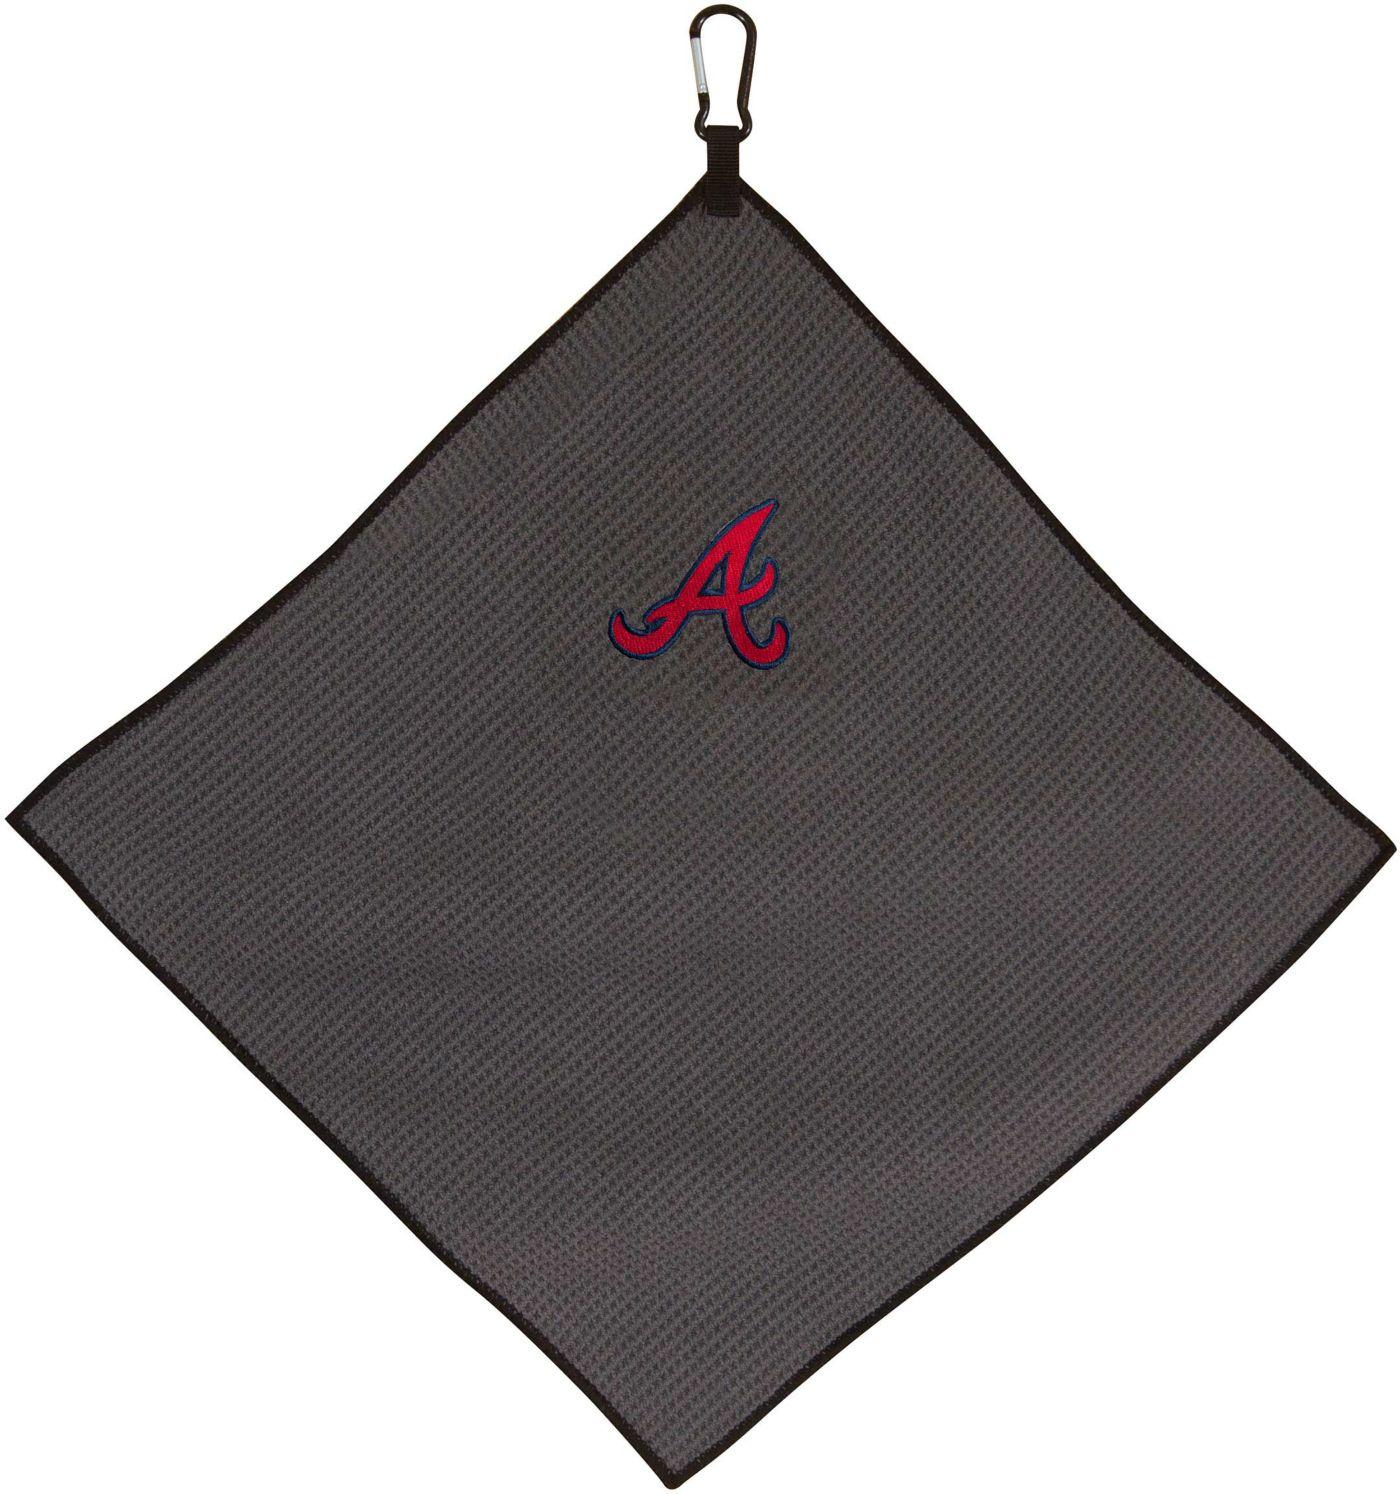 "Team Effort Atlanta Braves 15"" x 15"" Microfiber Golf Towel"